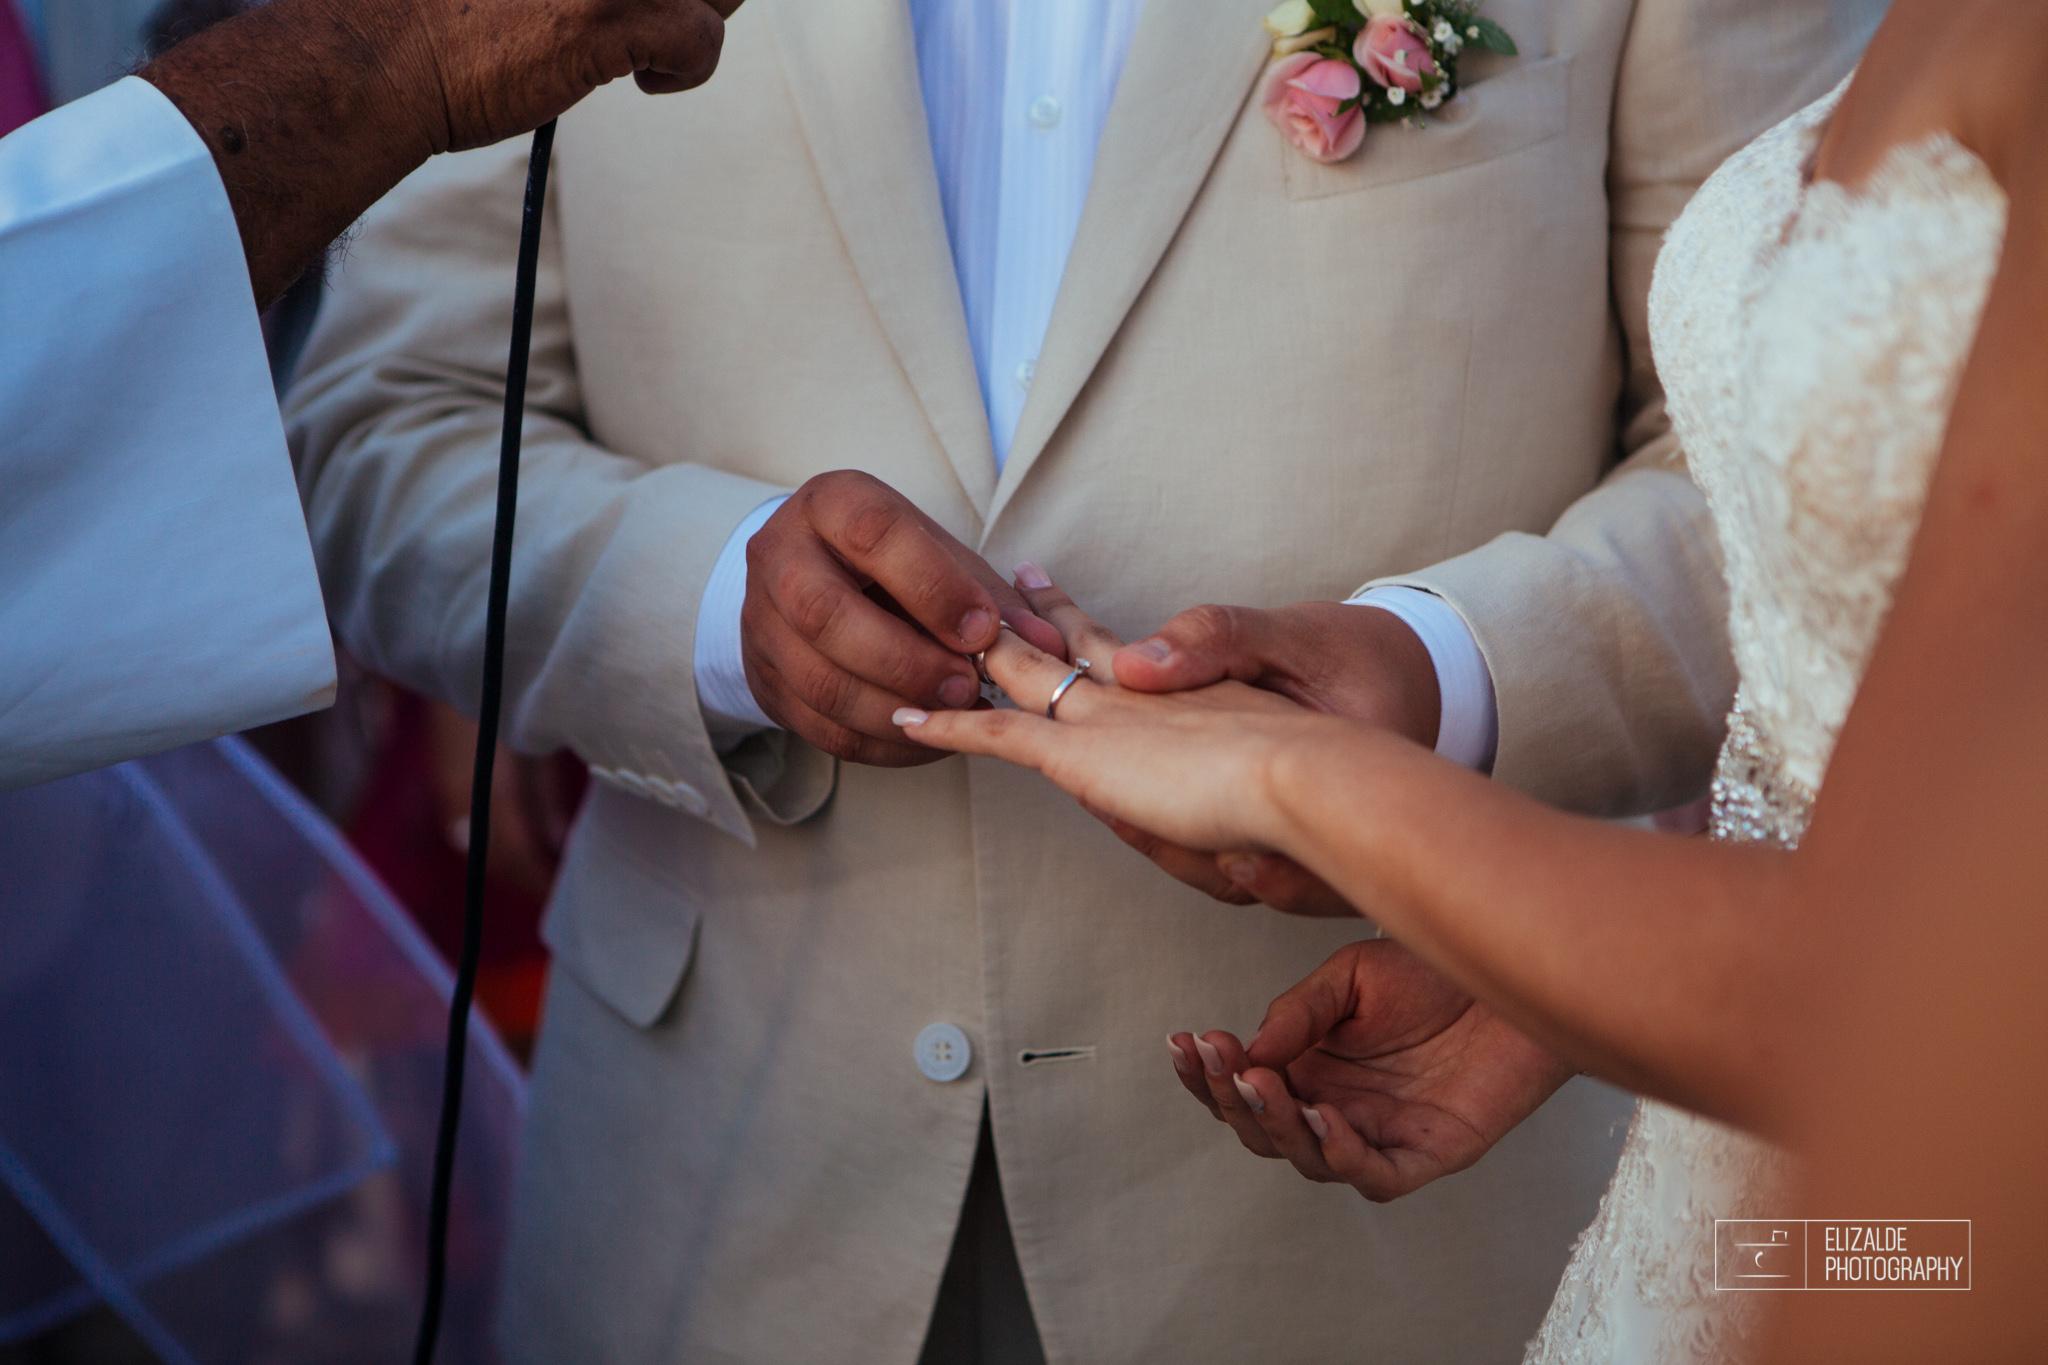 Pay and Ferran_Acapulco_Destination Wedding_Elizalde Photography-96.jpg